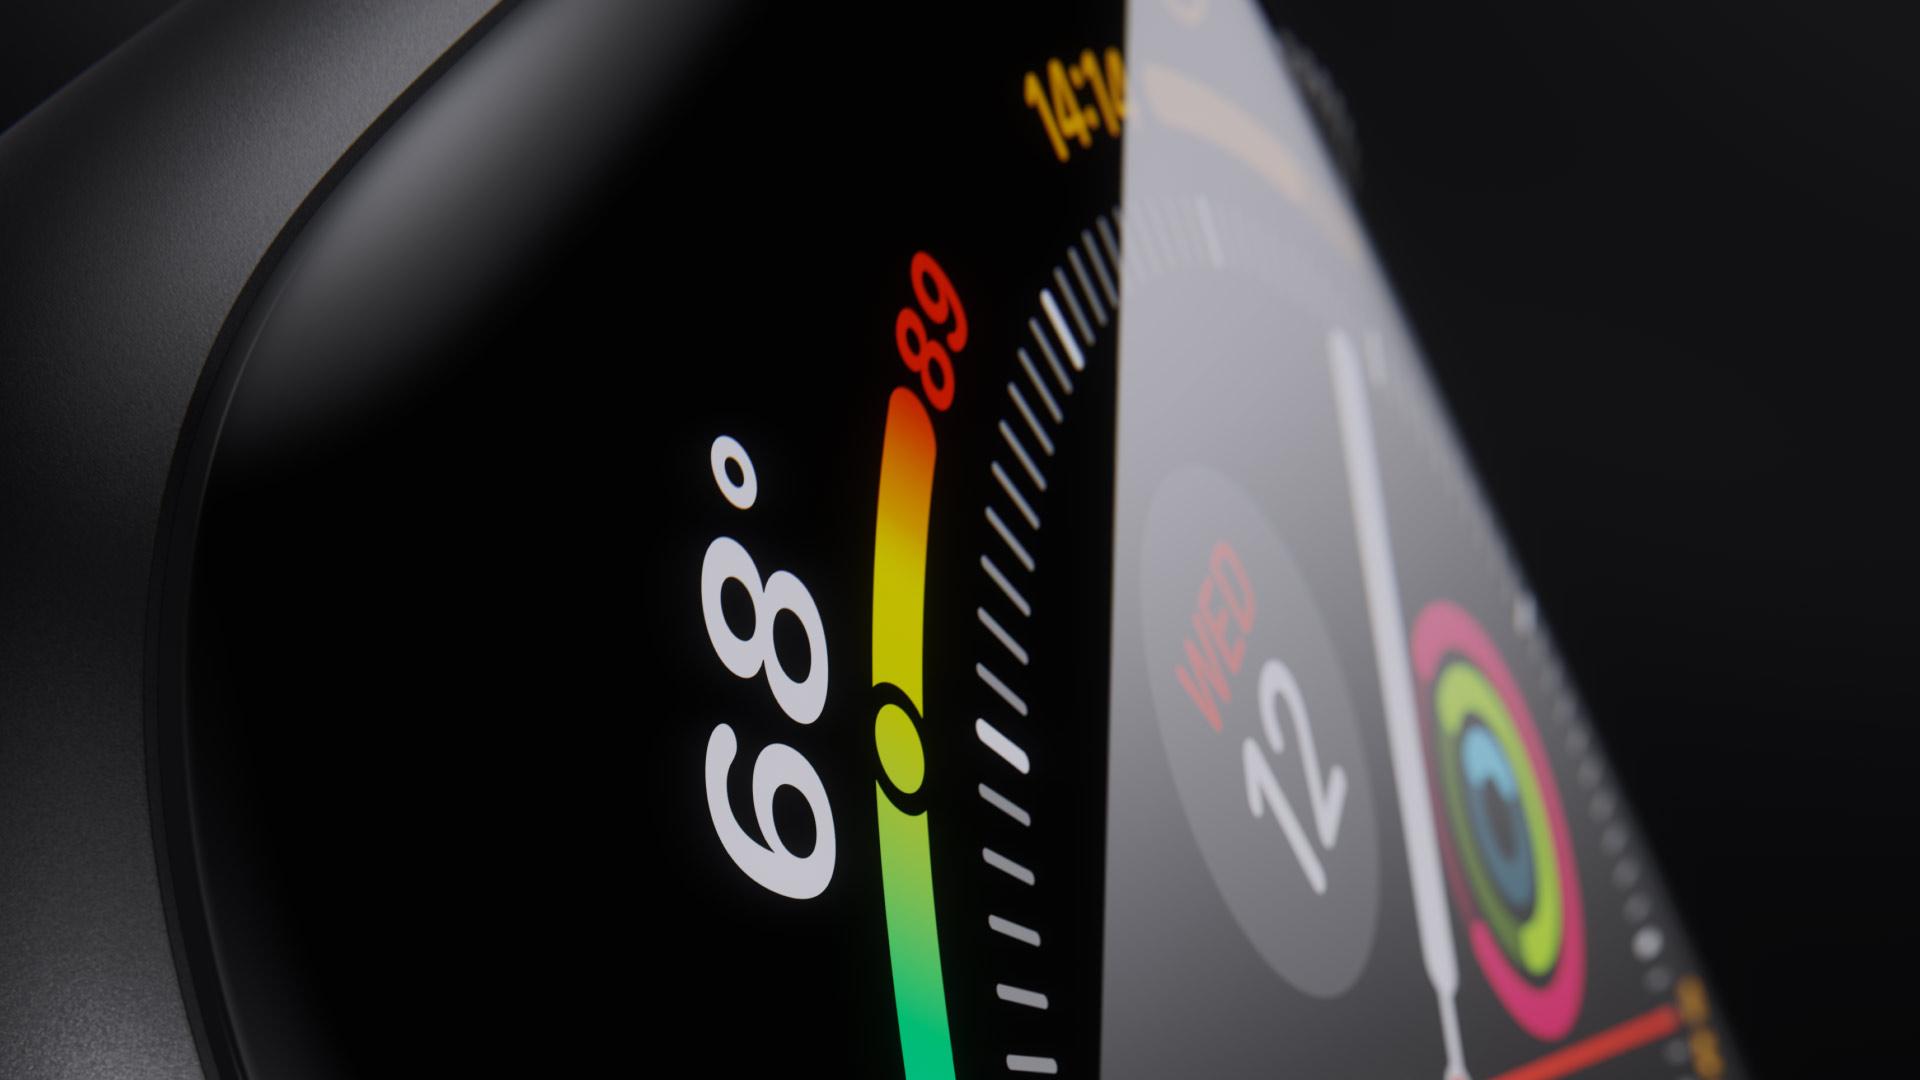 Unduh 1000 Wallpaper Apple Watch Series 4 HD Terbaru